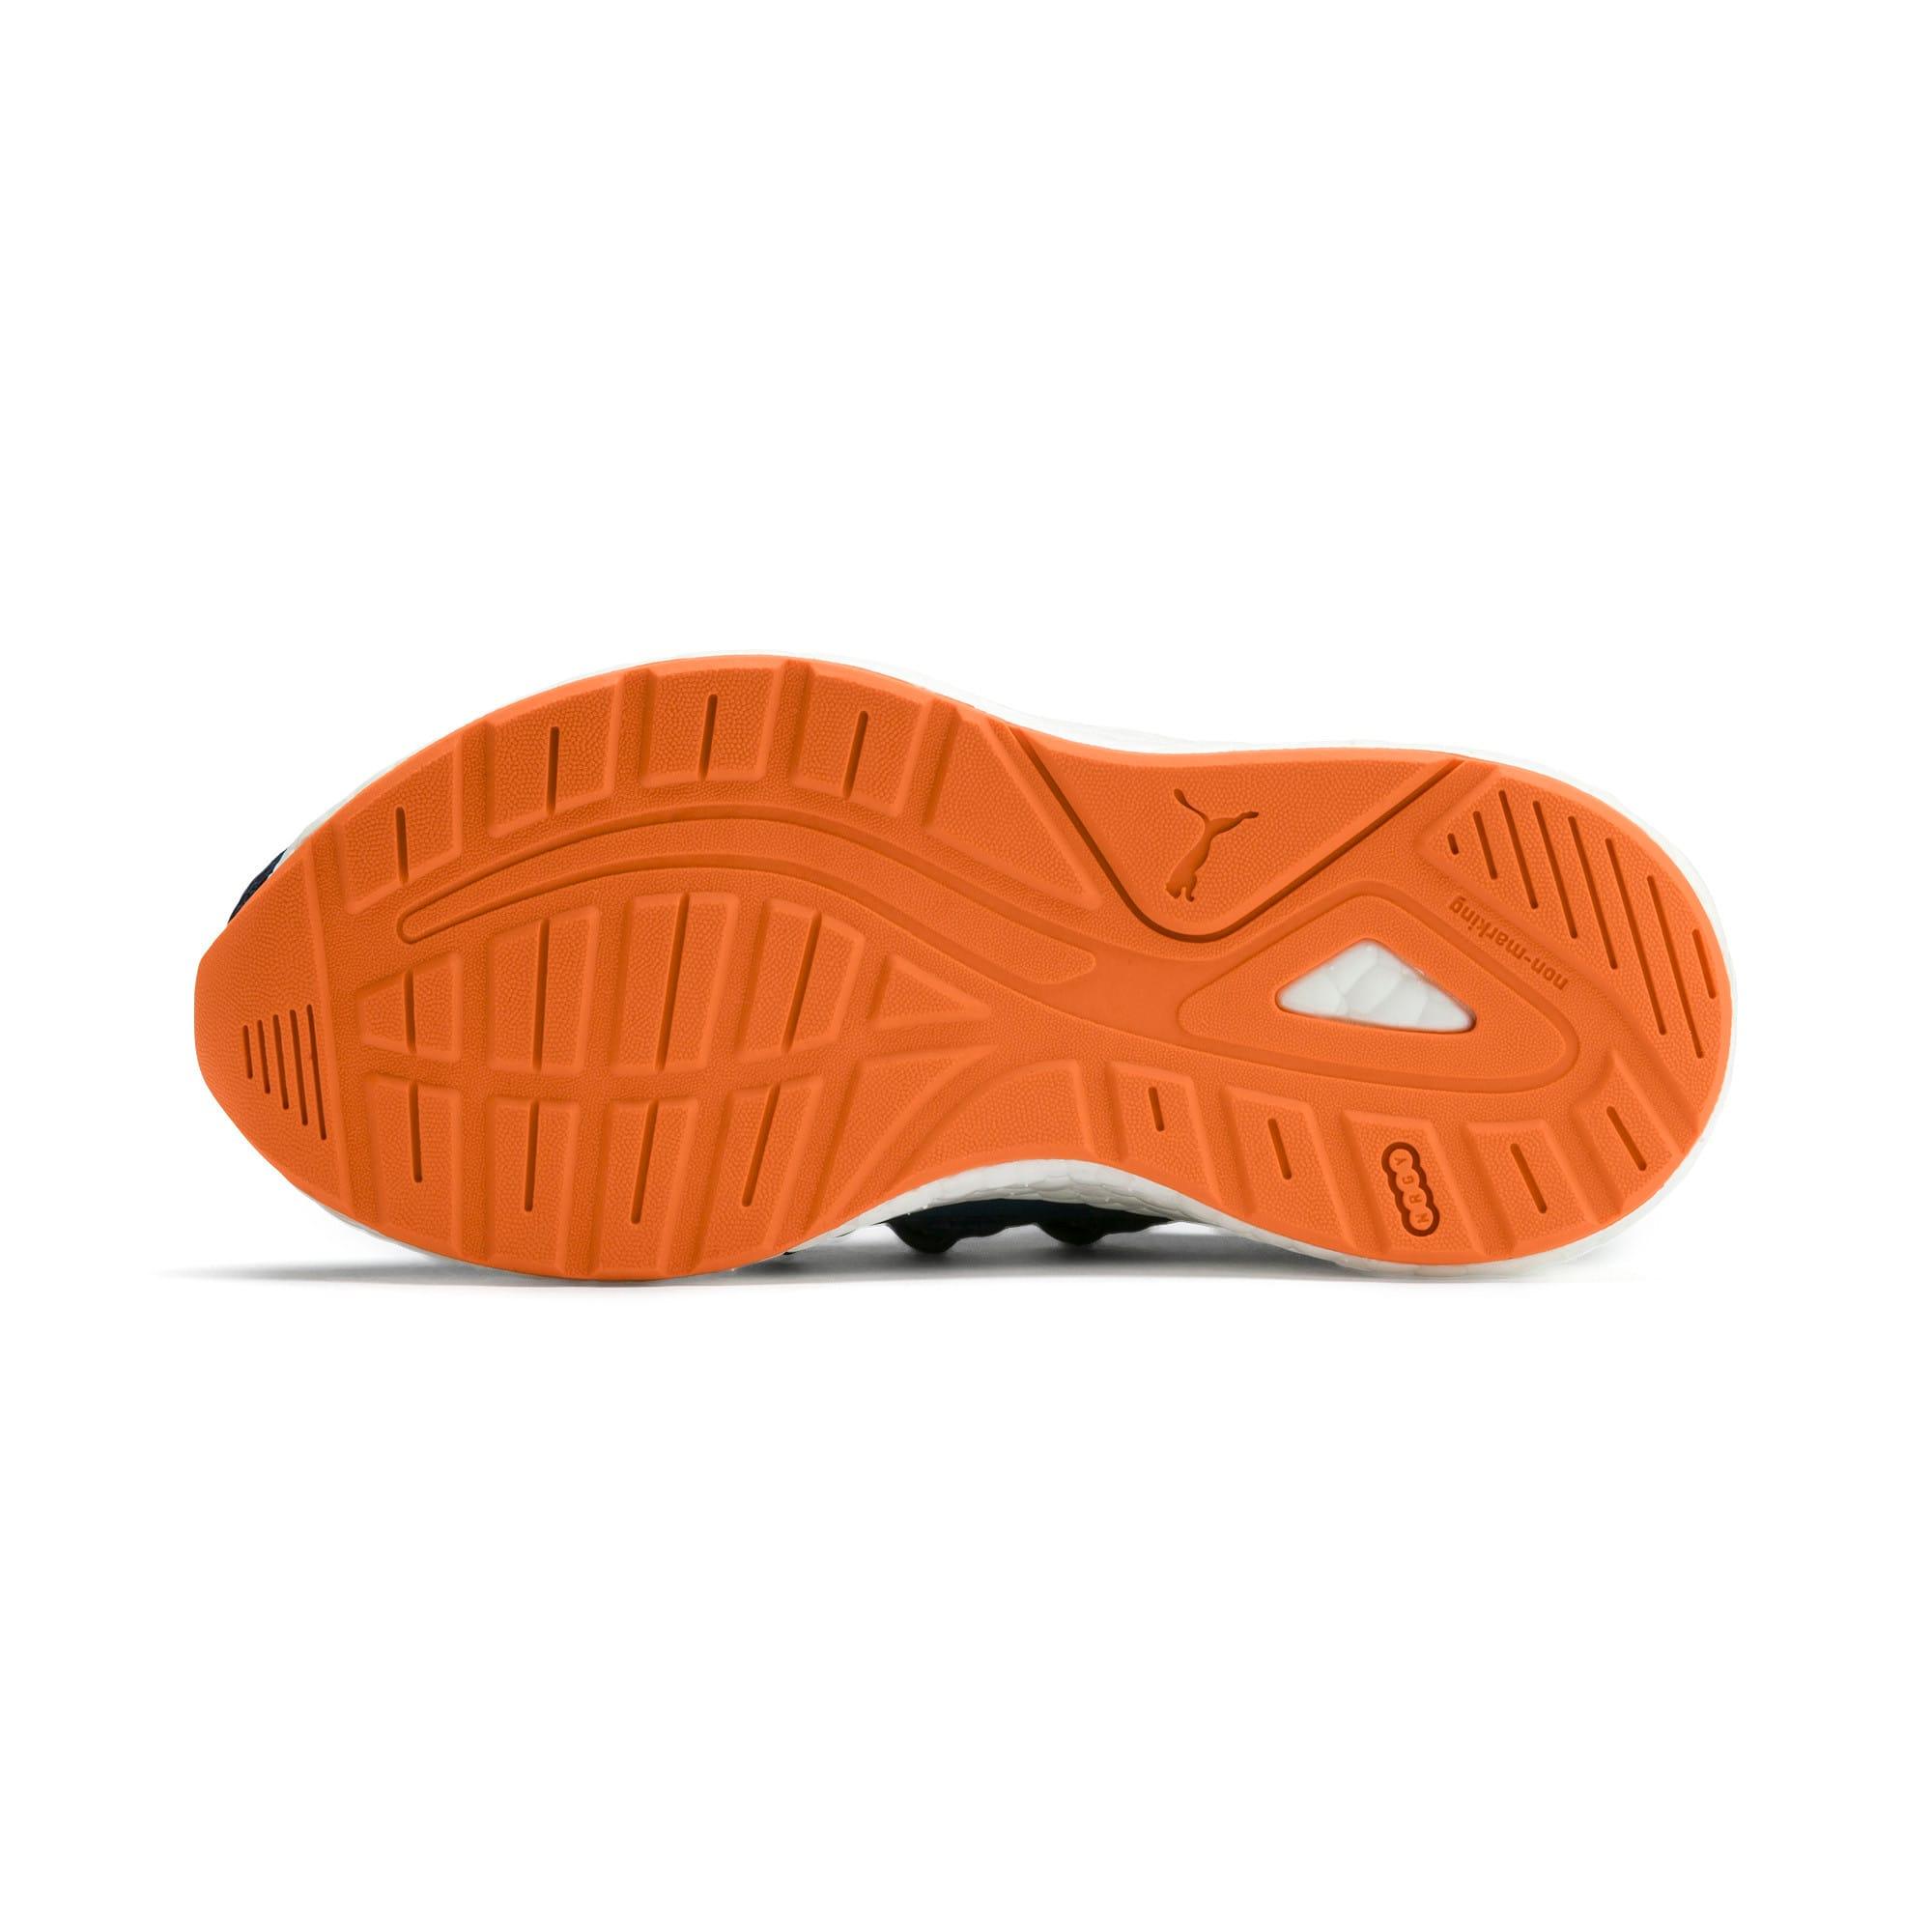 Miniatura 4 de Zapatos de punto NRGY Neko para PS, G Sea-Peacoat-J Orange-White, mediano